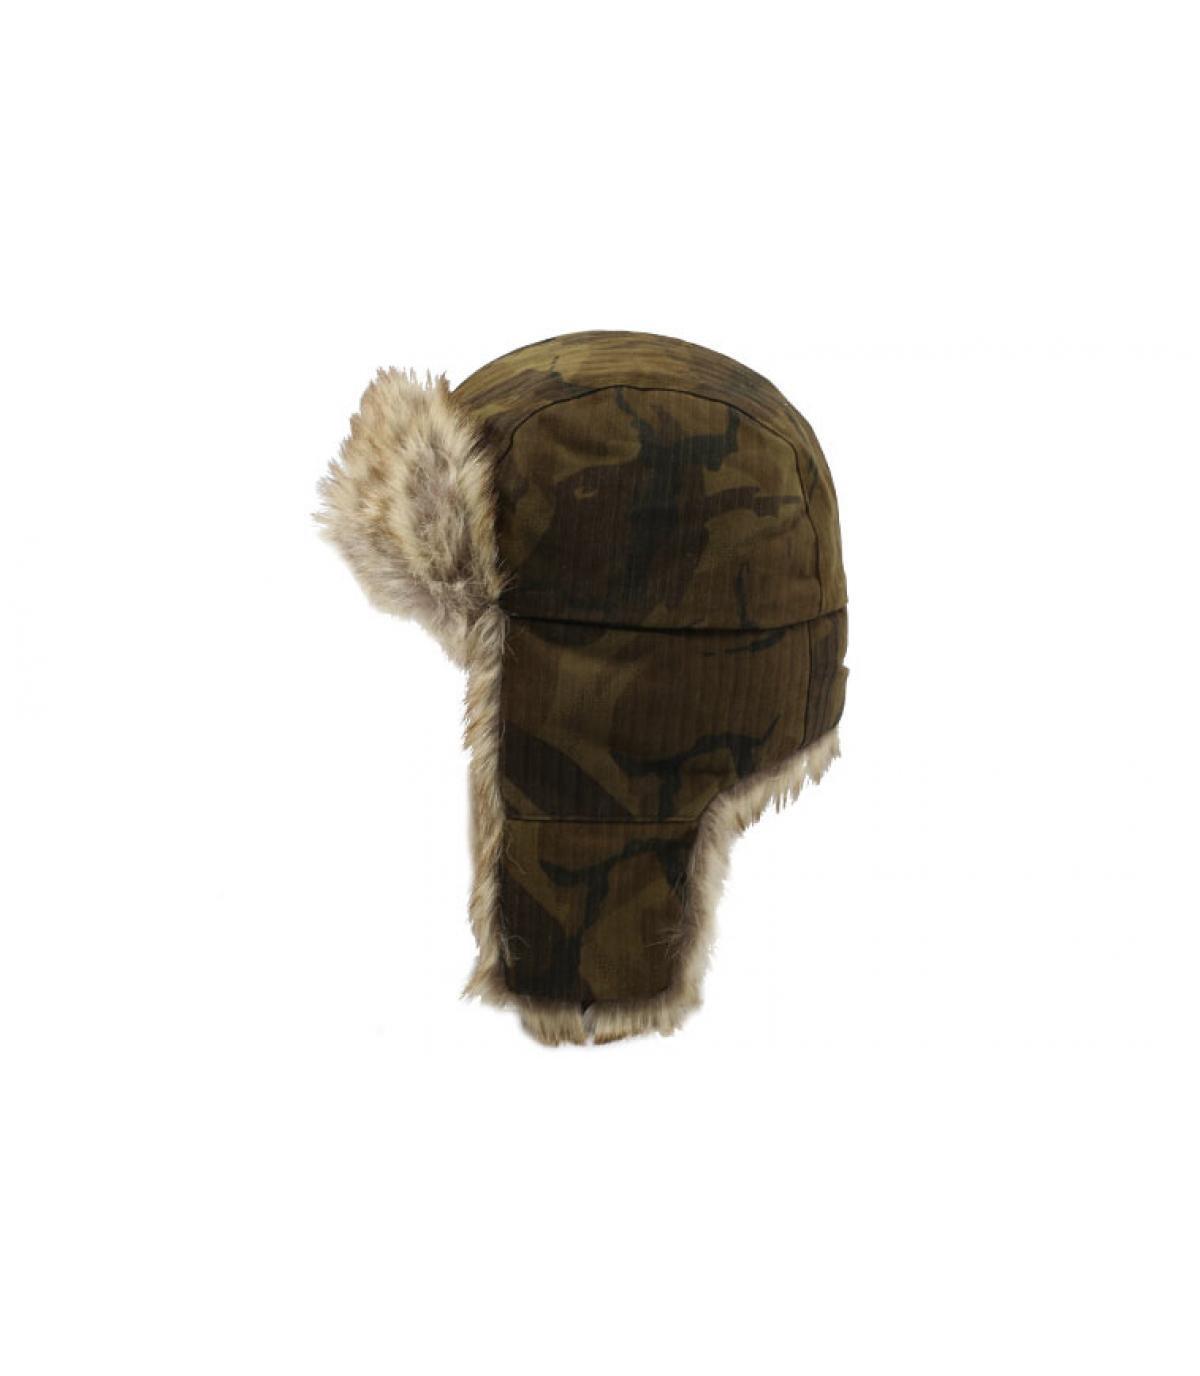 Detalles Bomber Cap Waxed Cotton Camouflage imagen 2